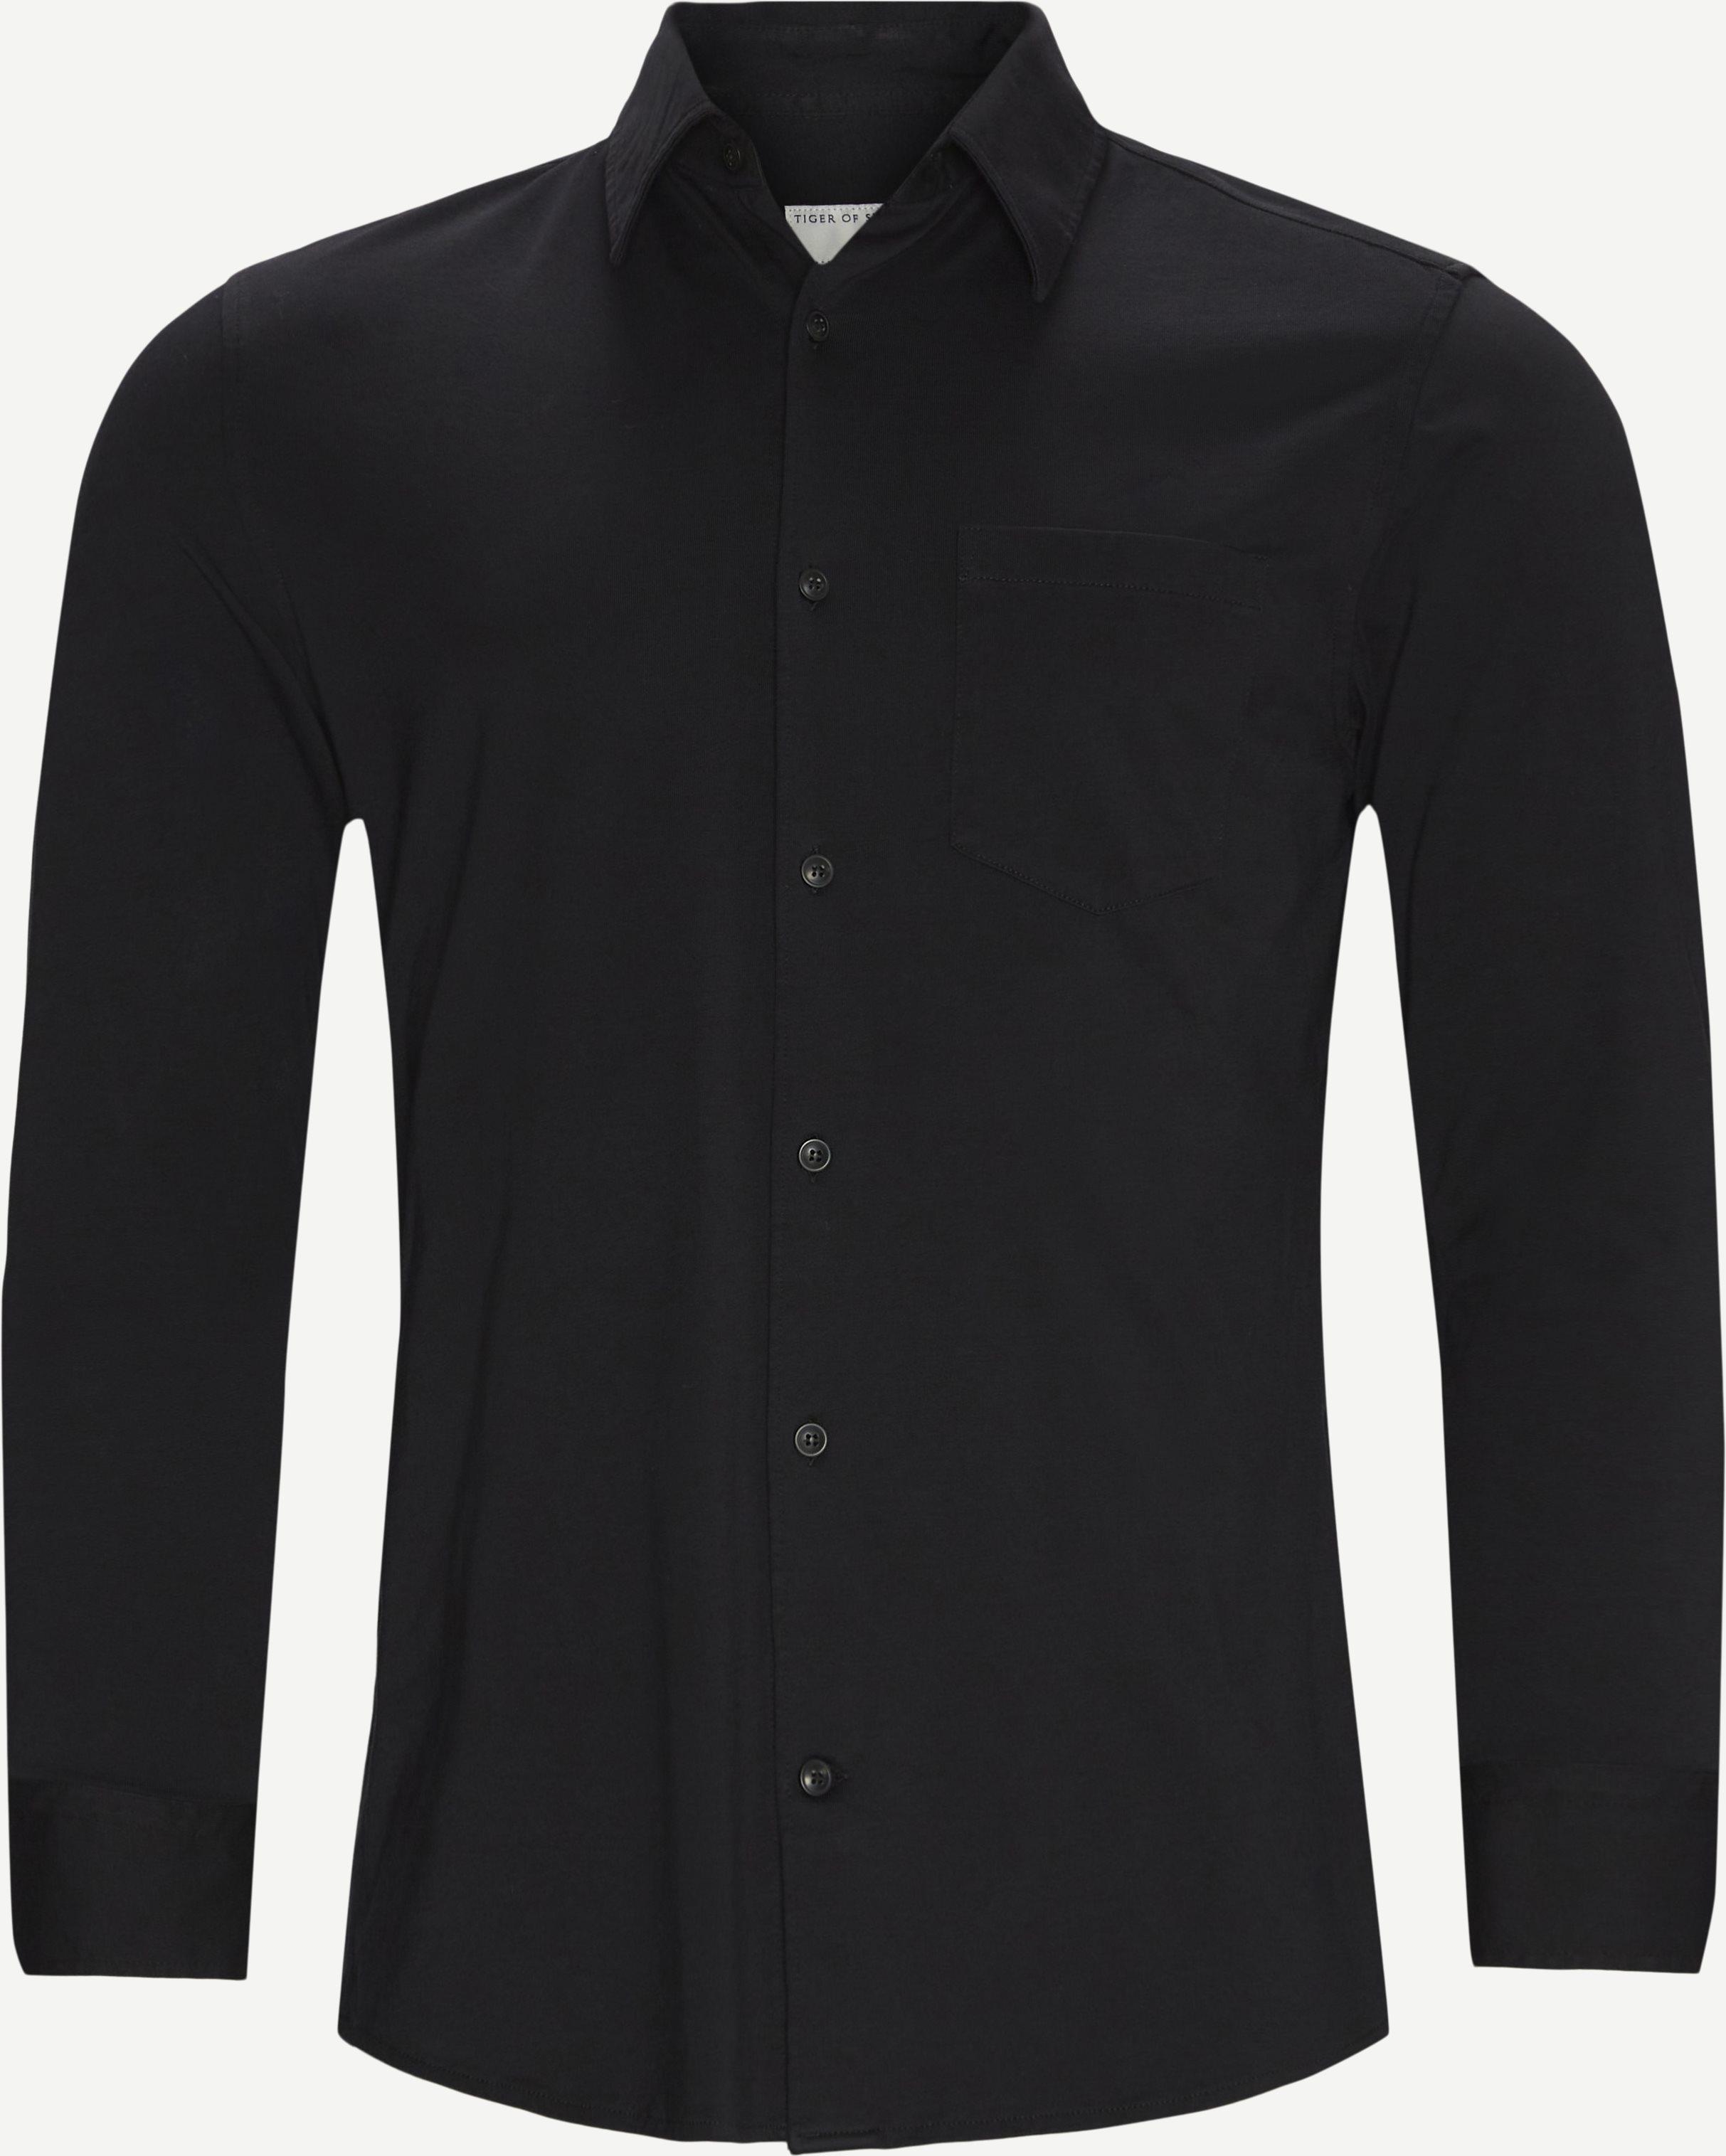 Hemden - Regular fit - Schwarz